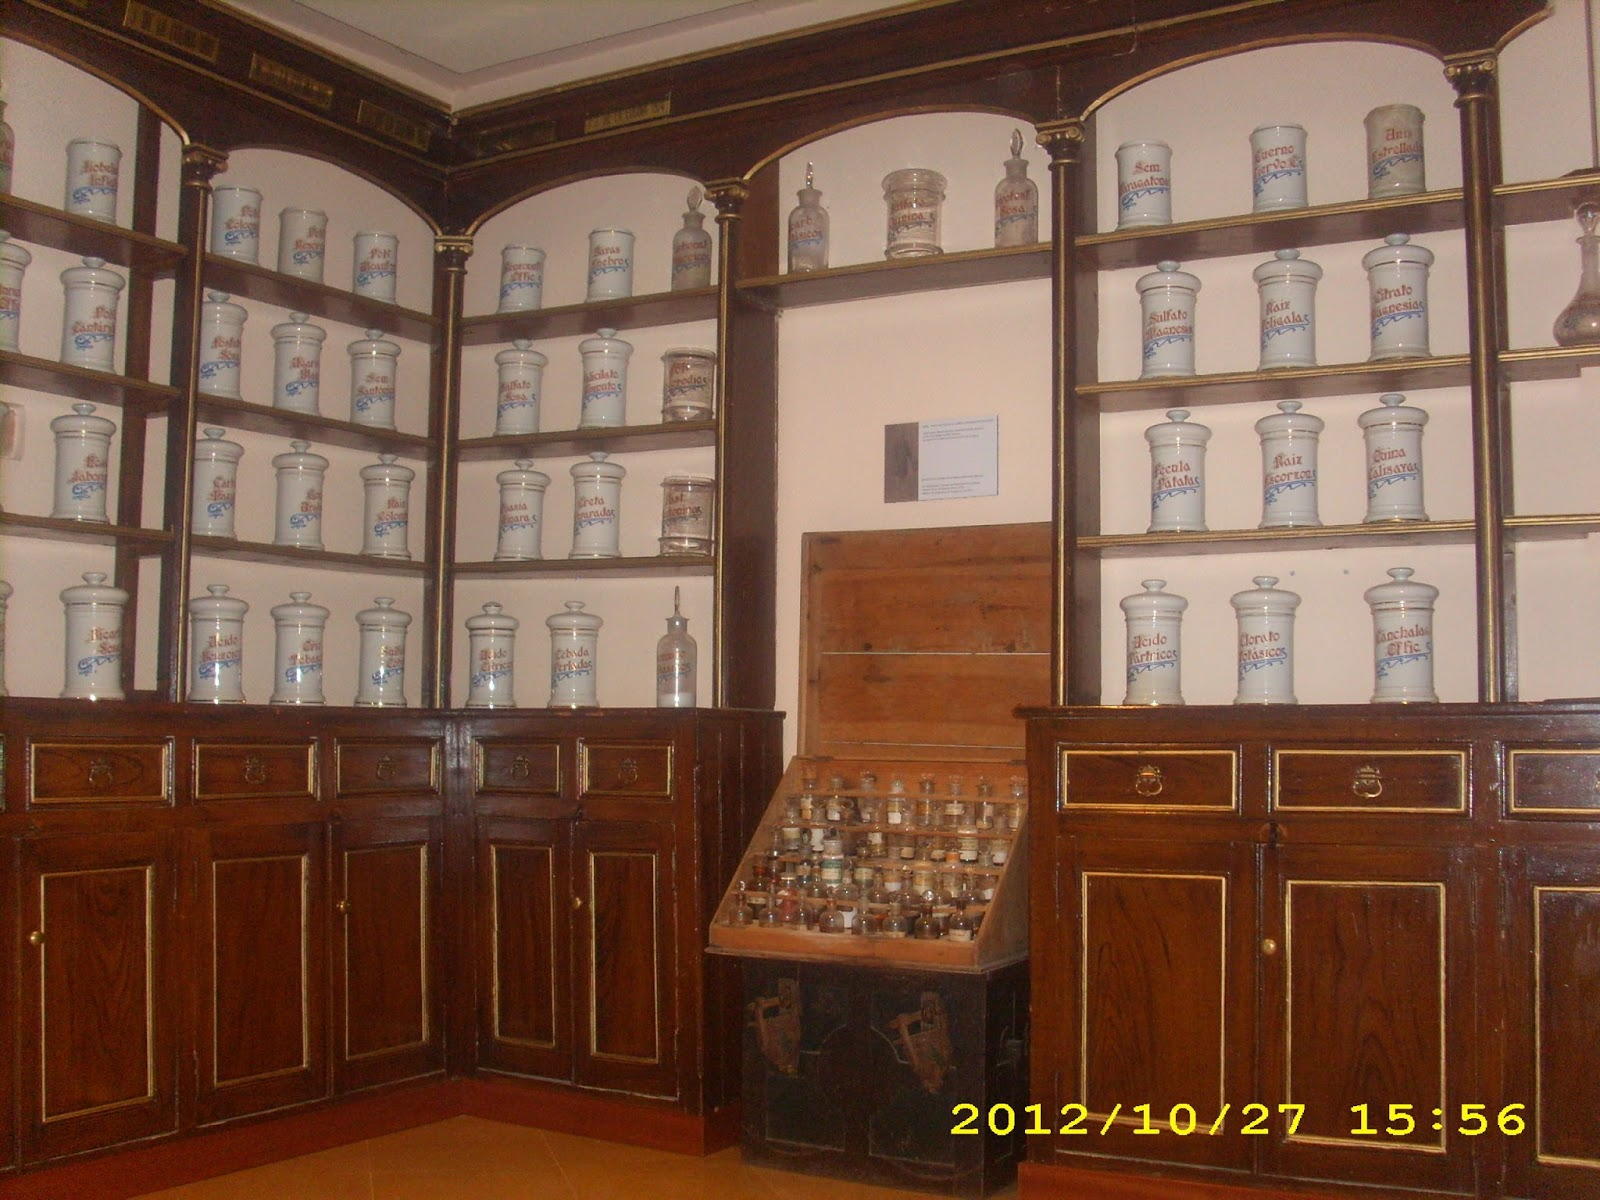 Recikla arte estanter a restaurada de una rebotica - Muebles segunda mano bizkaia ...